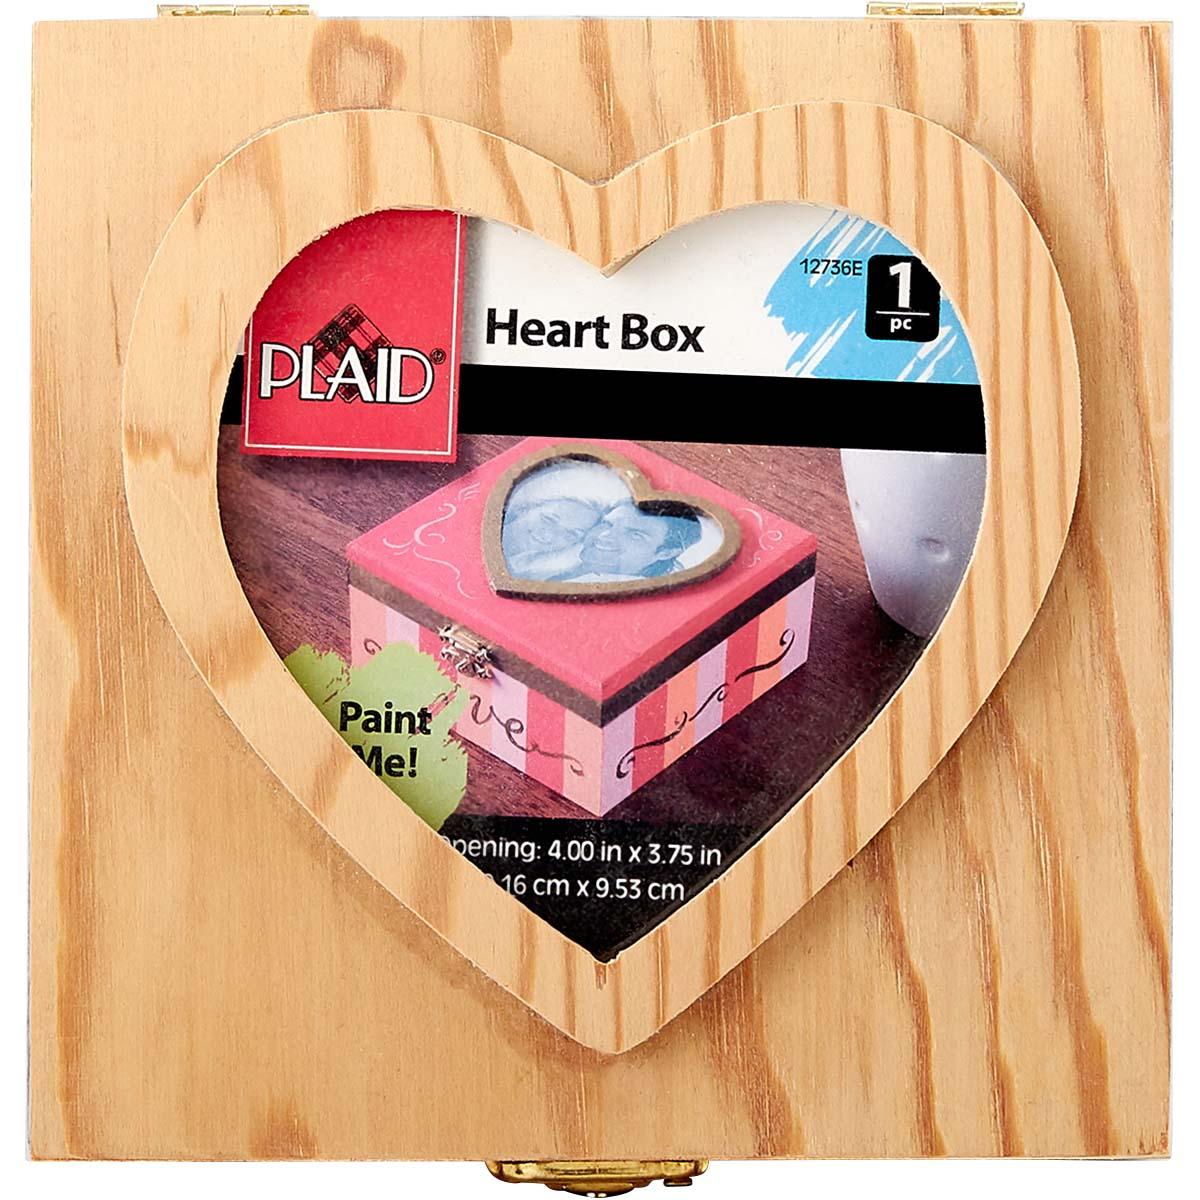 Plaid ® Wood Surfaces - Heart Box - 12736